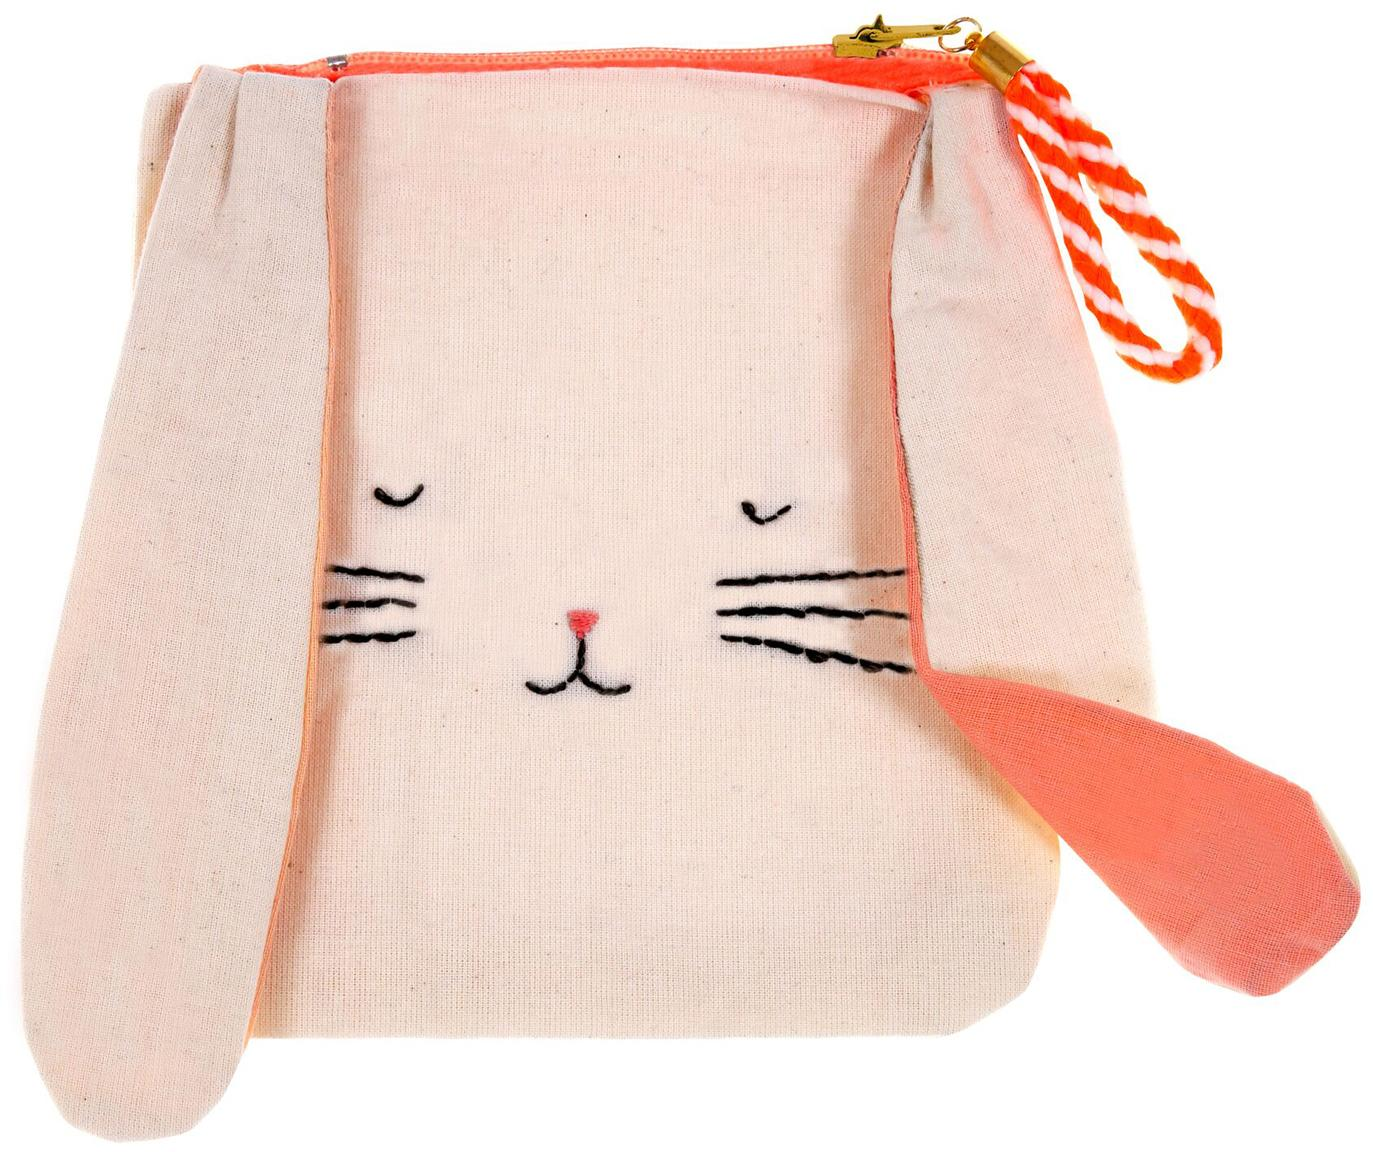 Kinder portemonnee Bunny, Linnen, Beige, oranje, zwart, 13 x 15 cm